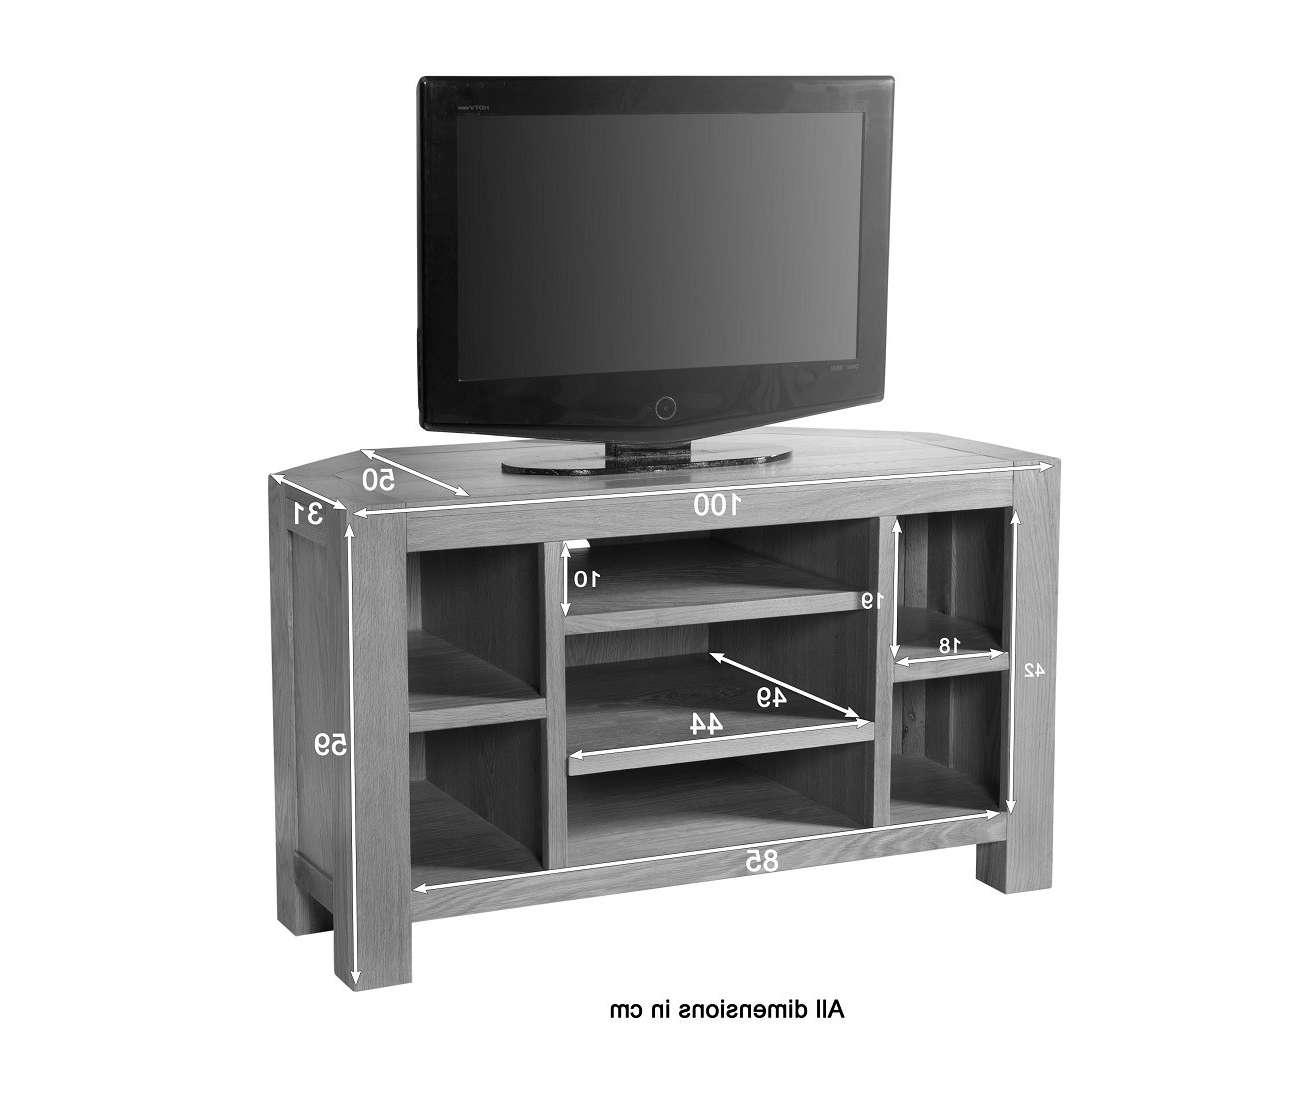 Aylesbury Contemporary Light Oak Corner Tv Unit   Oak Furniture Uk Regarding Light Oak Corner Tv Cabinets (View 20 of 20)